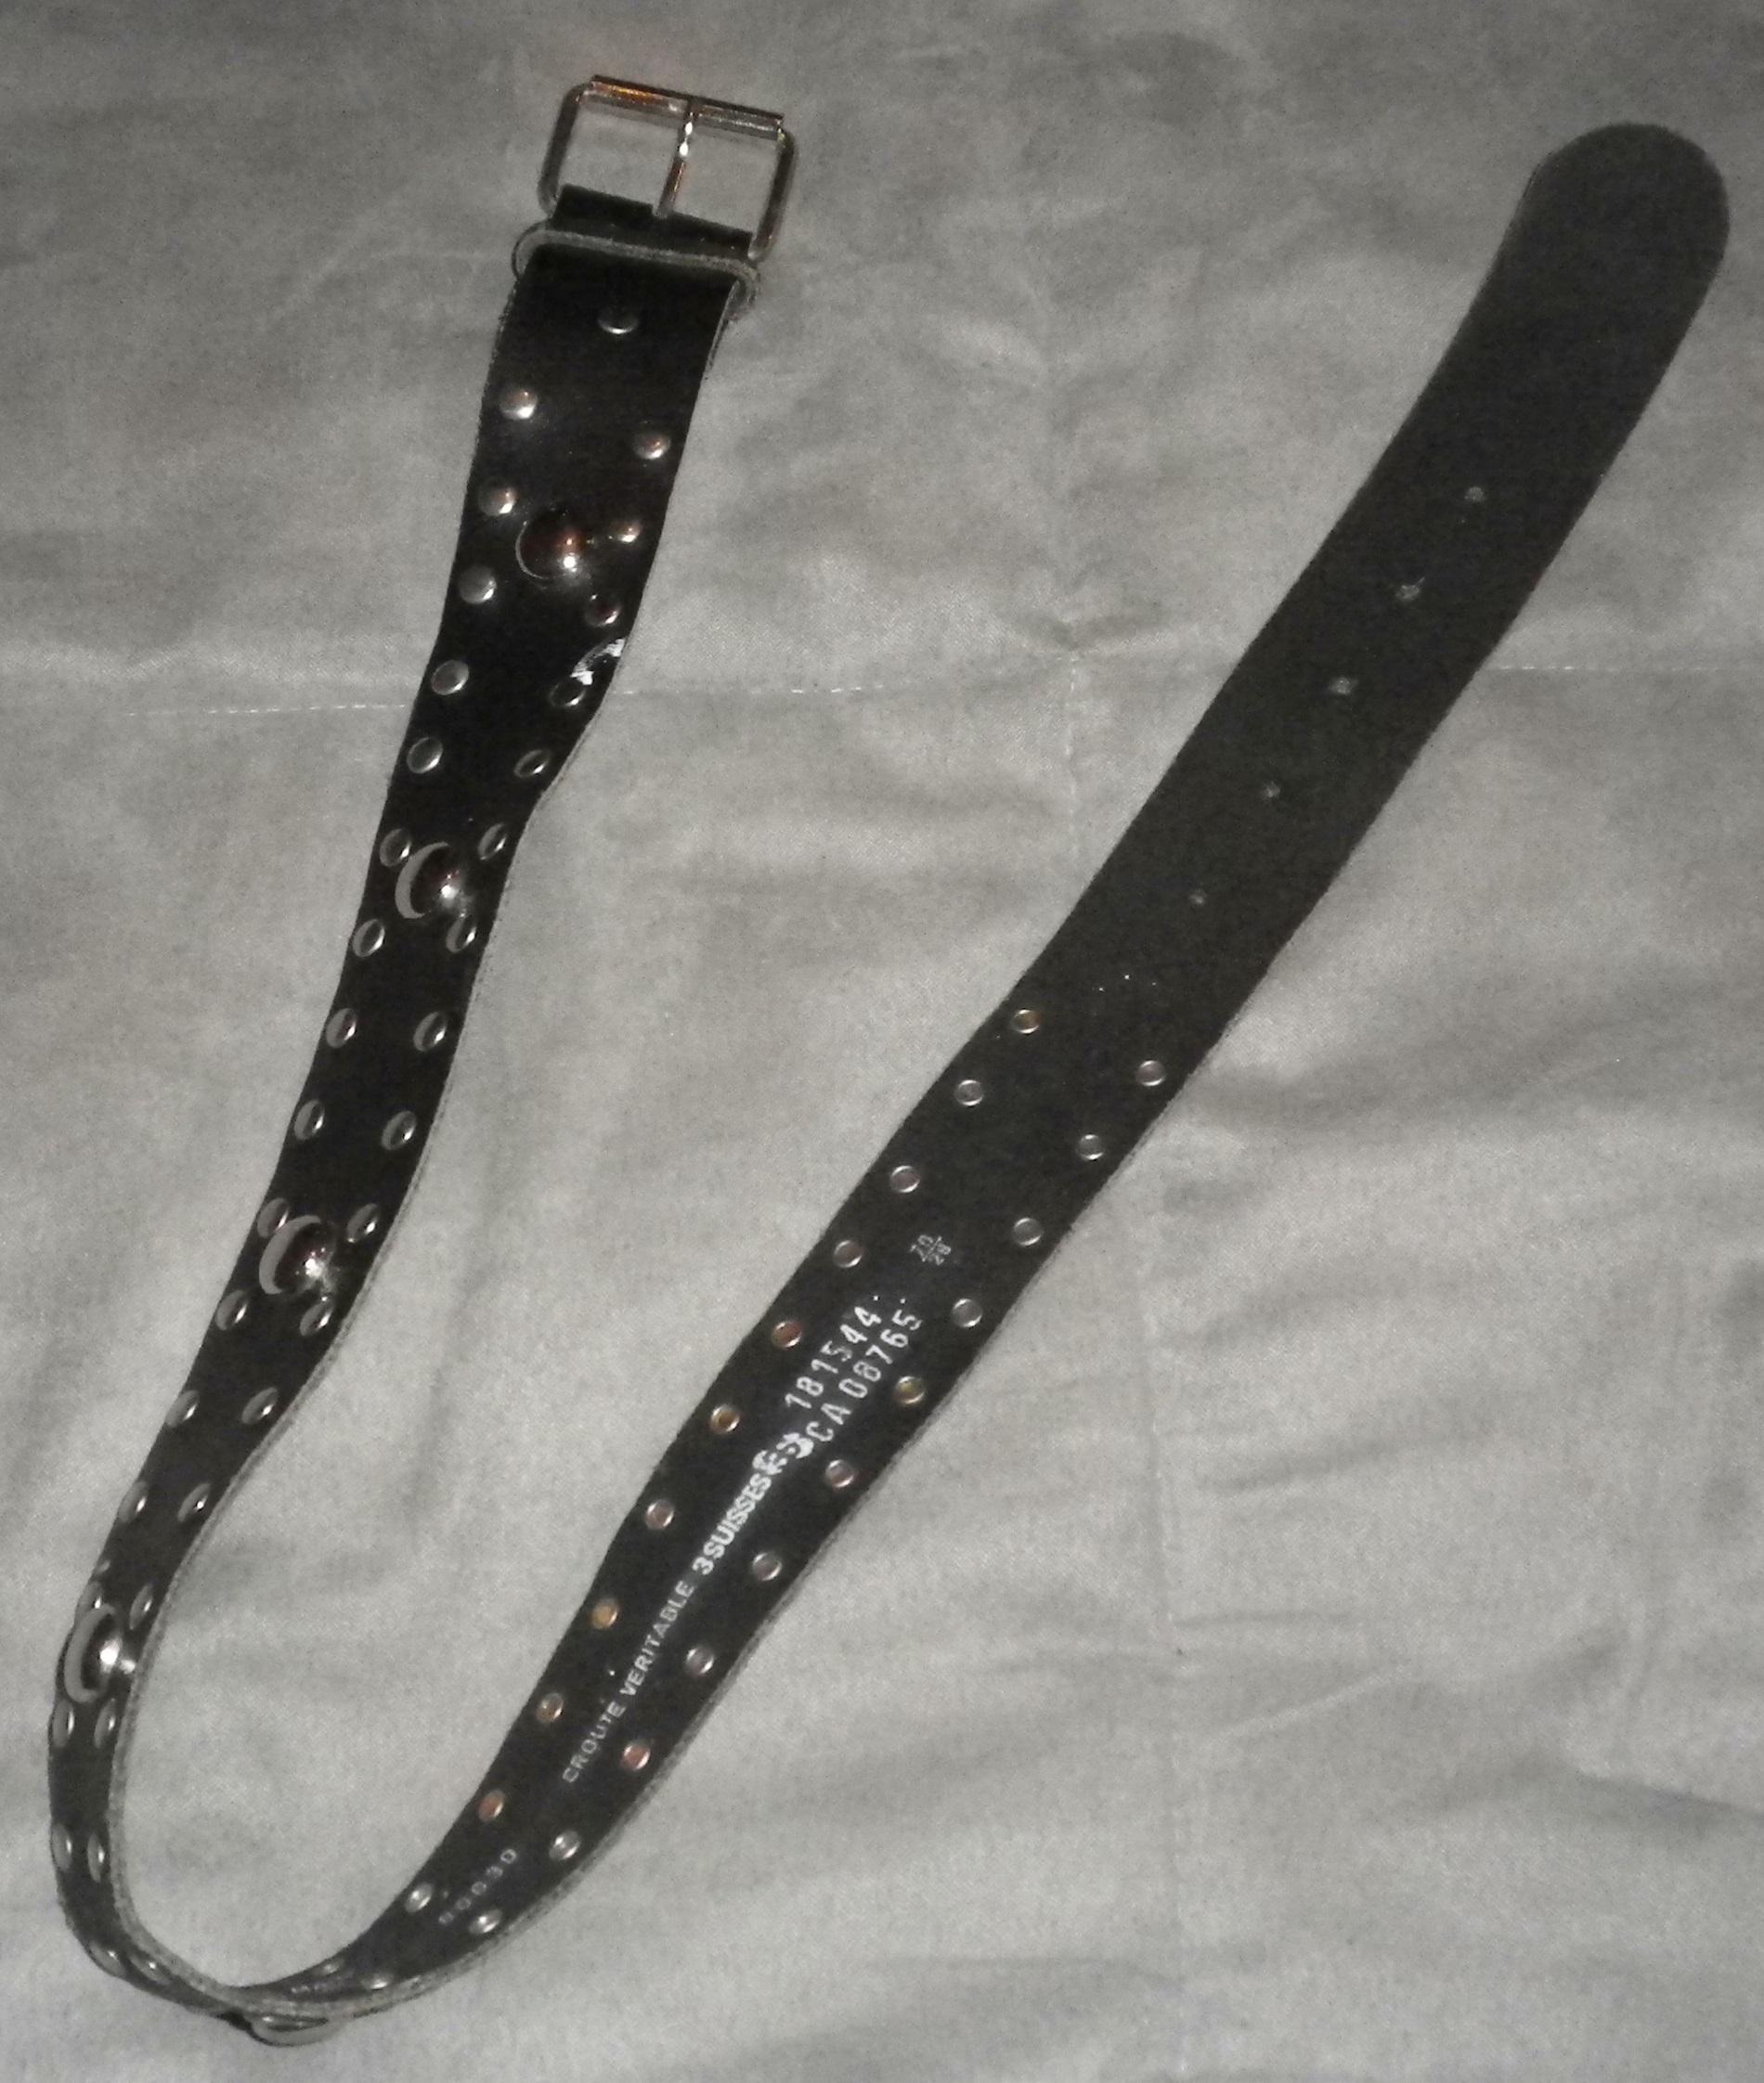 troc de troc ceinture en cuir image 0